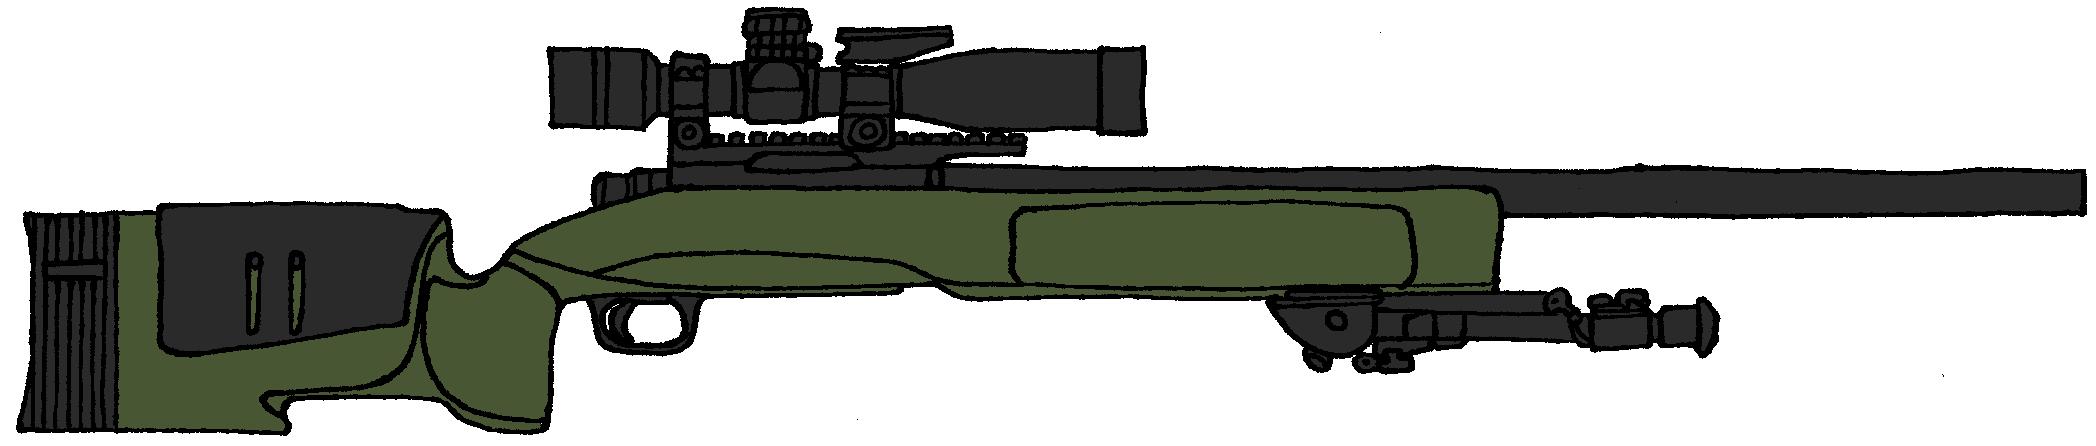 Pin On Sniper Rifles